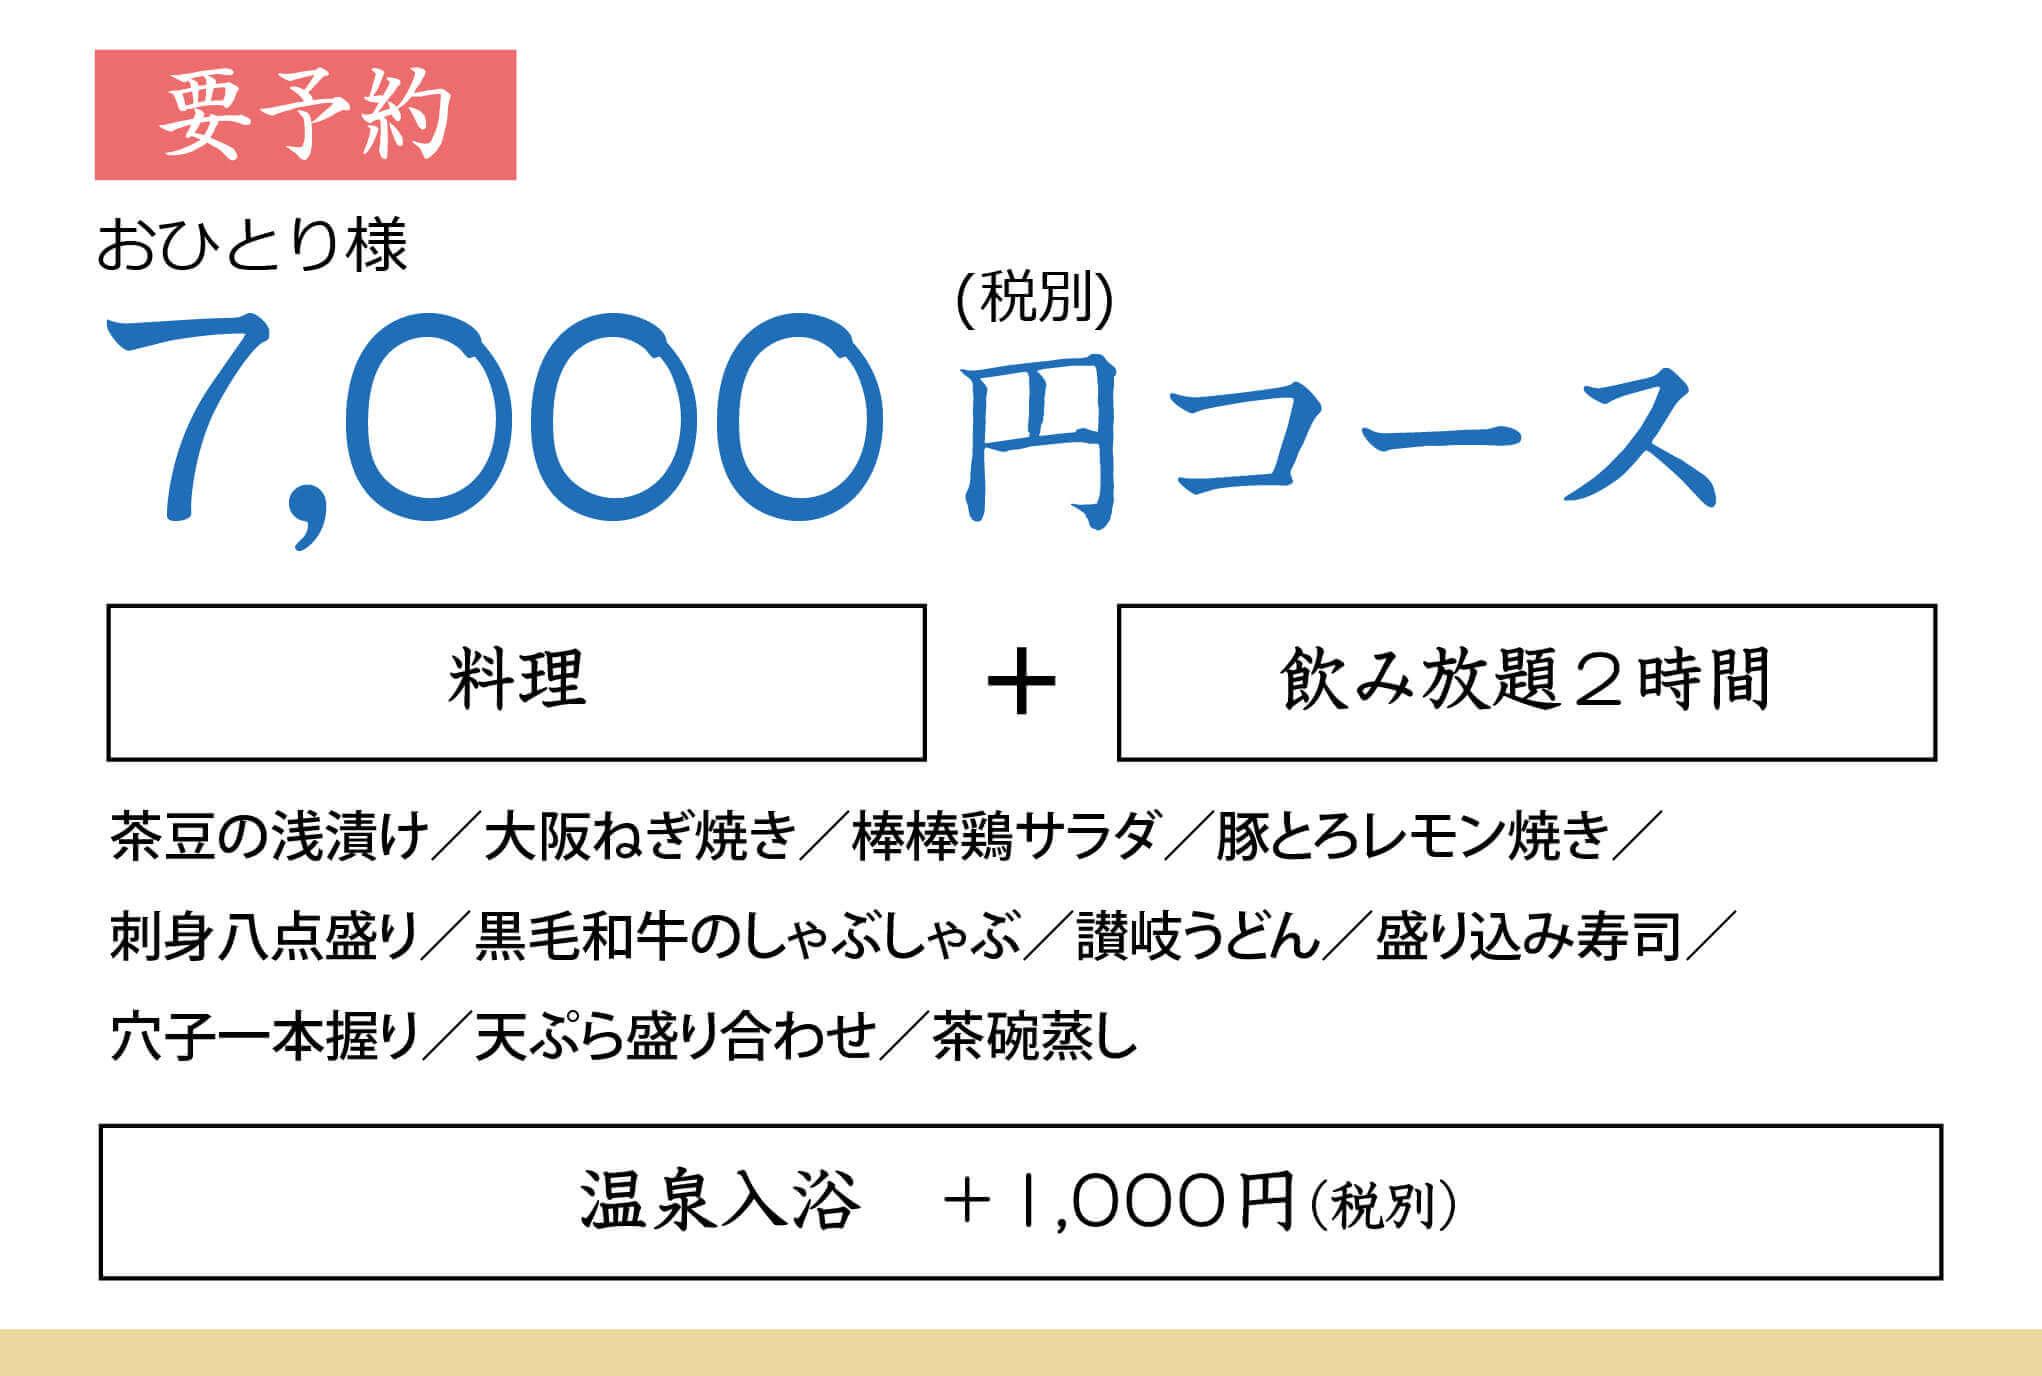 7,000円